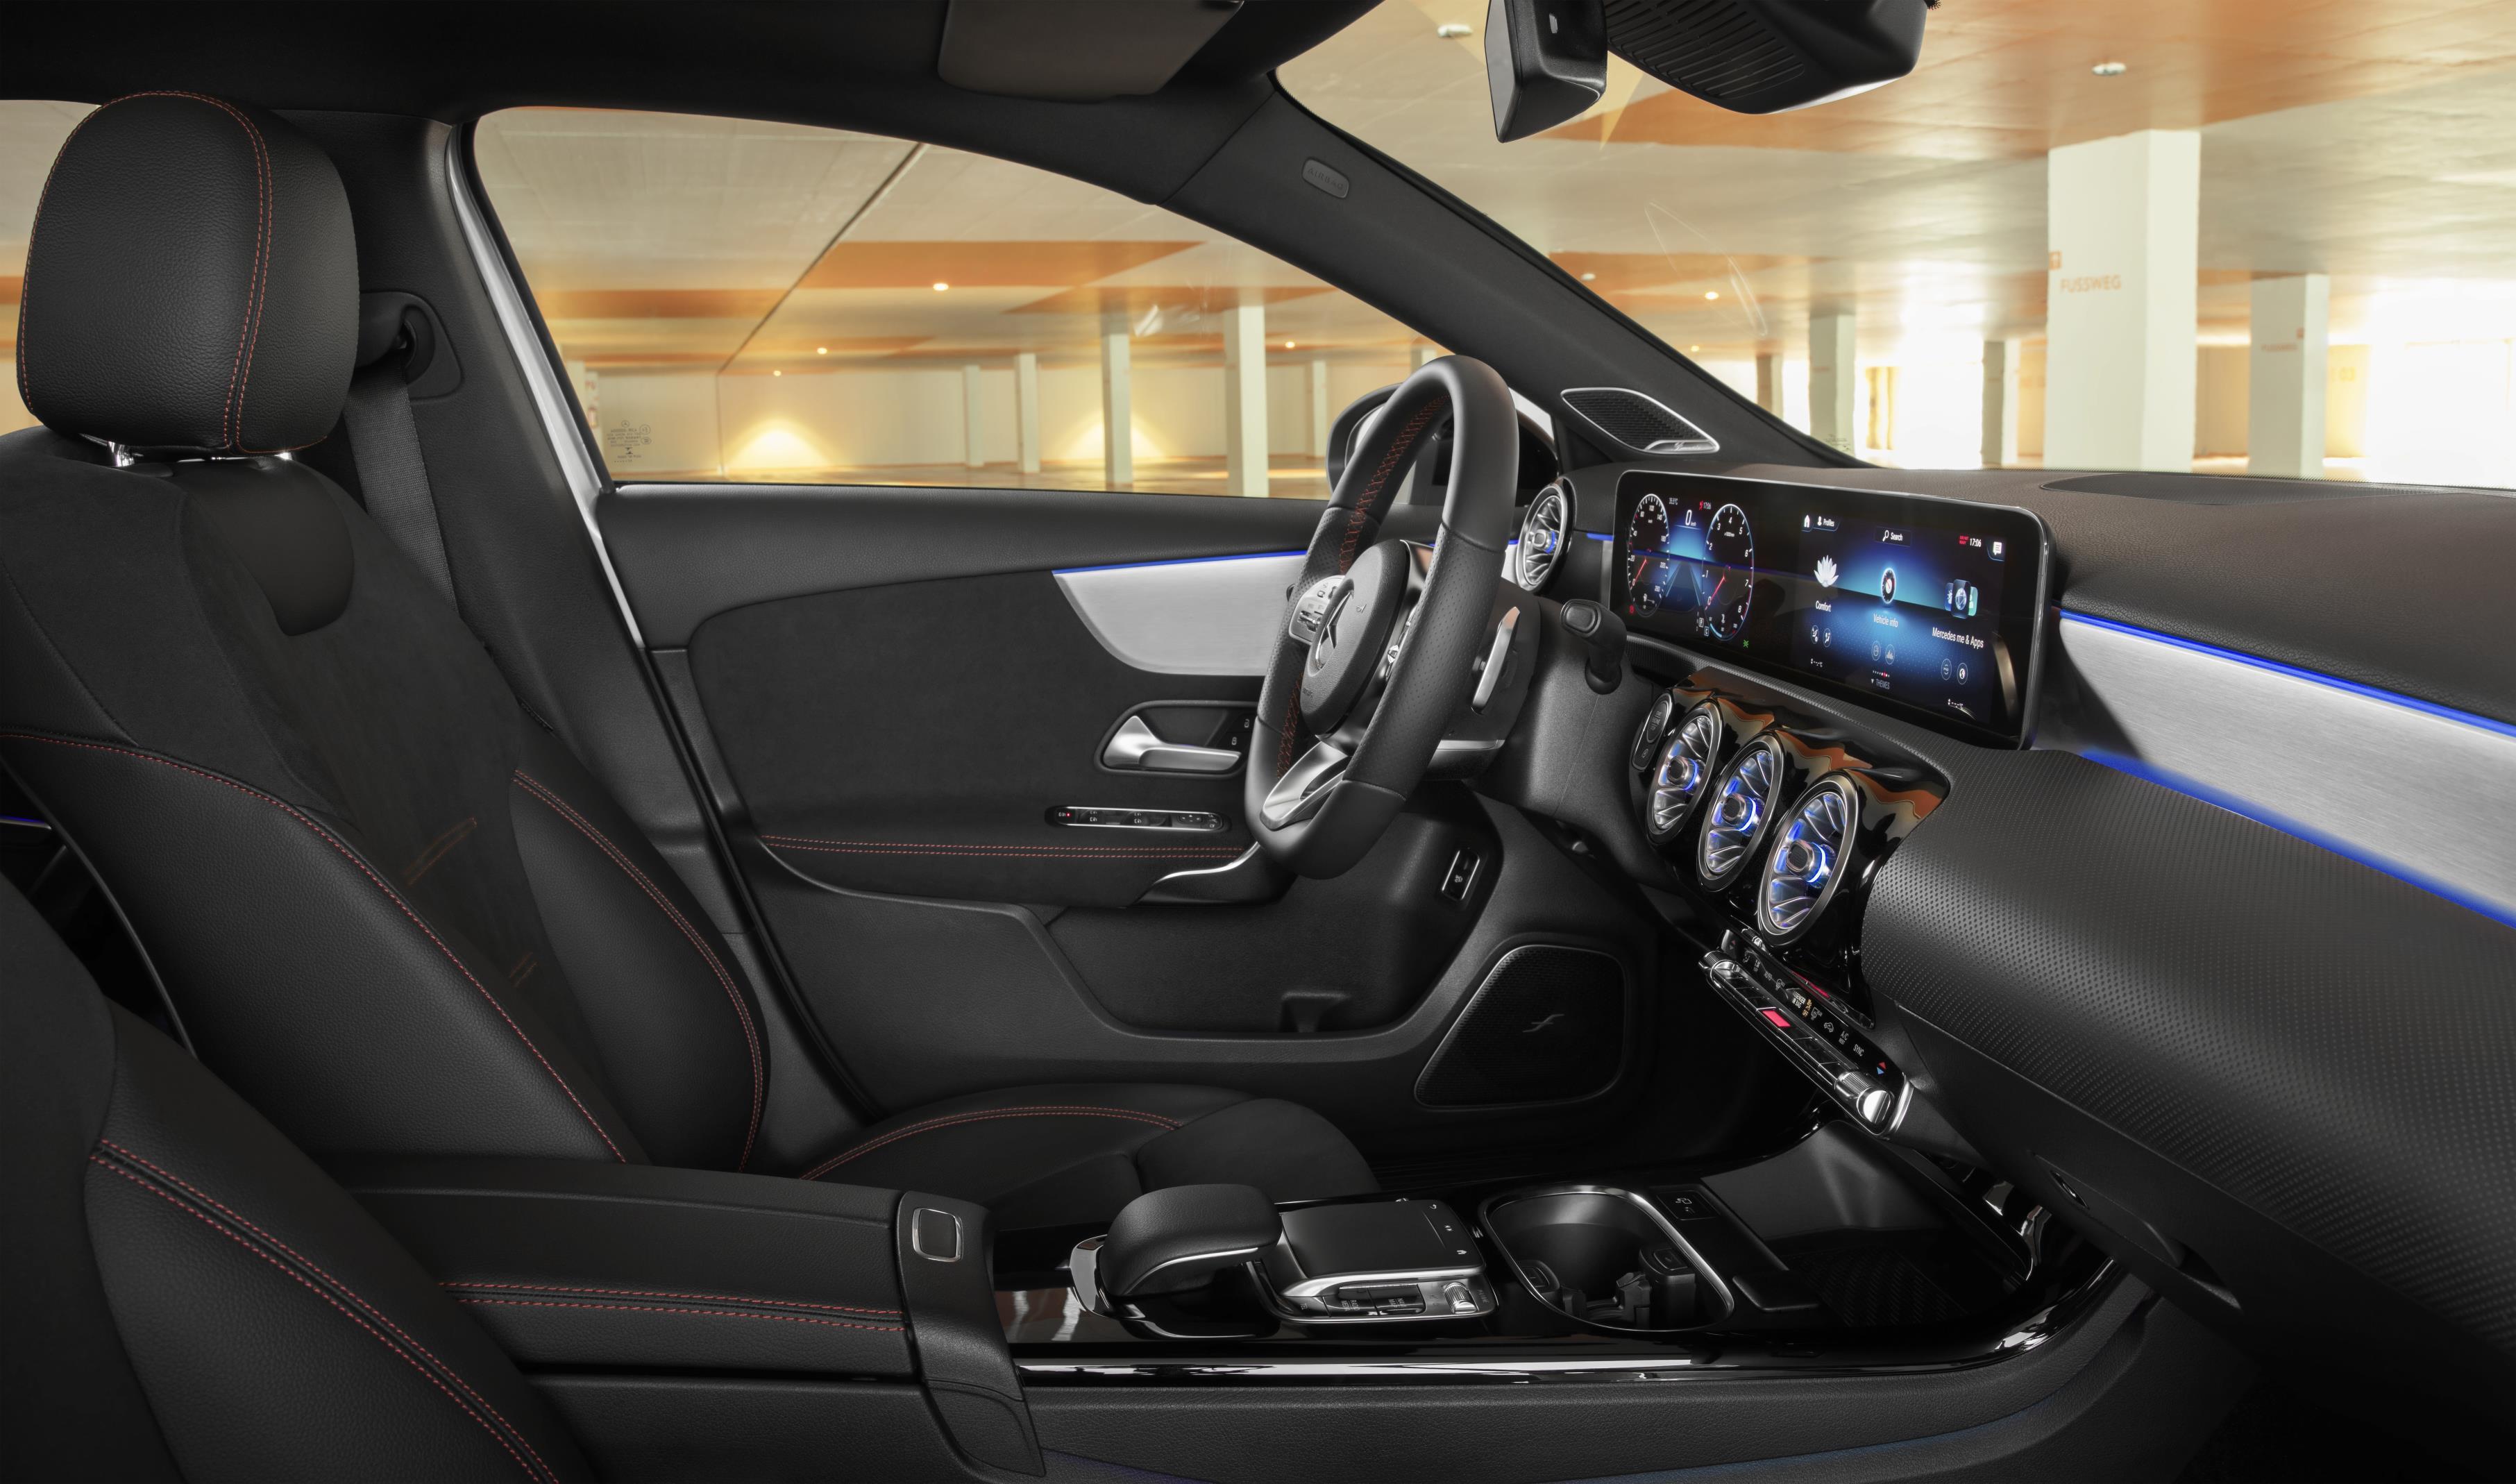 Mercedes-Benz A200 sedan - 2